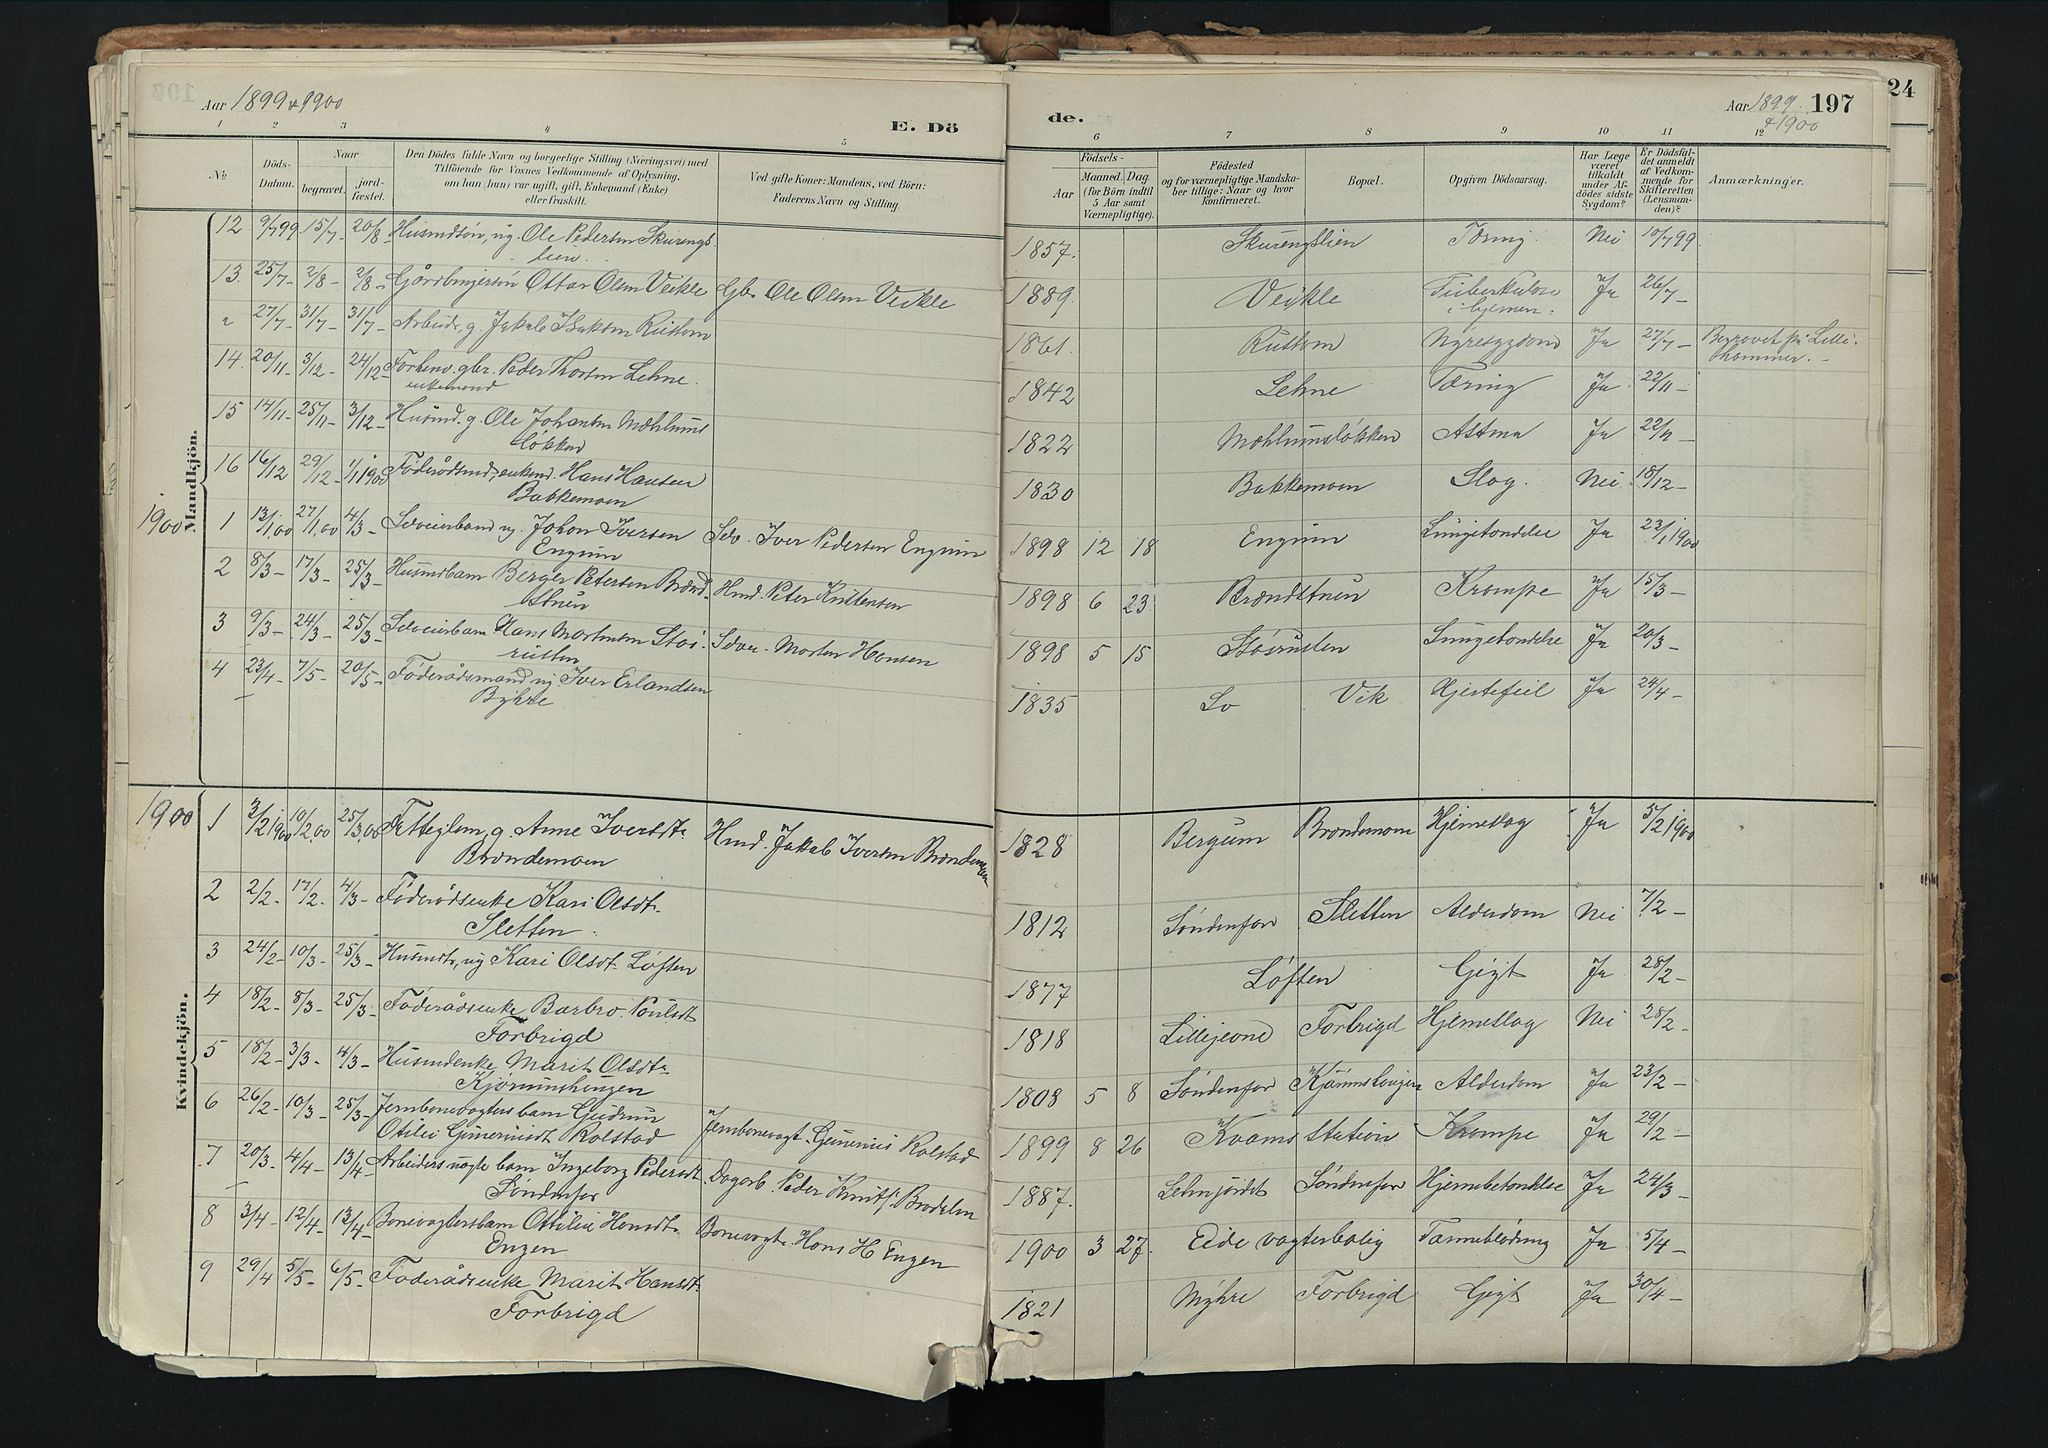 SAH, Nord-Fron prestekontor, Ministerialbok nr. 3, 1884-1914, s. 197